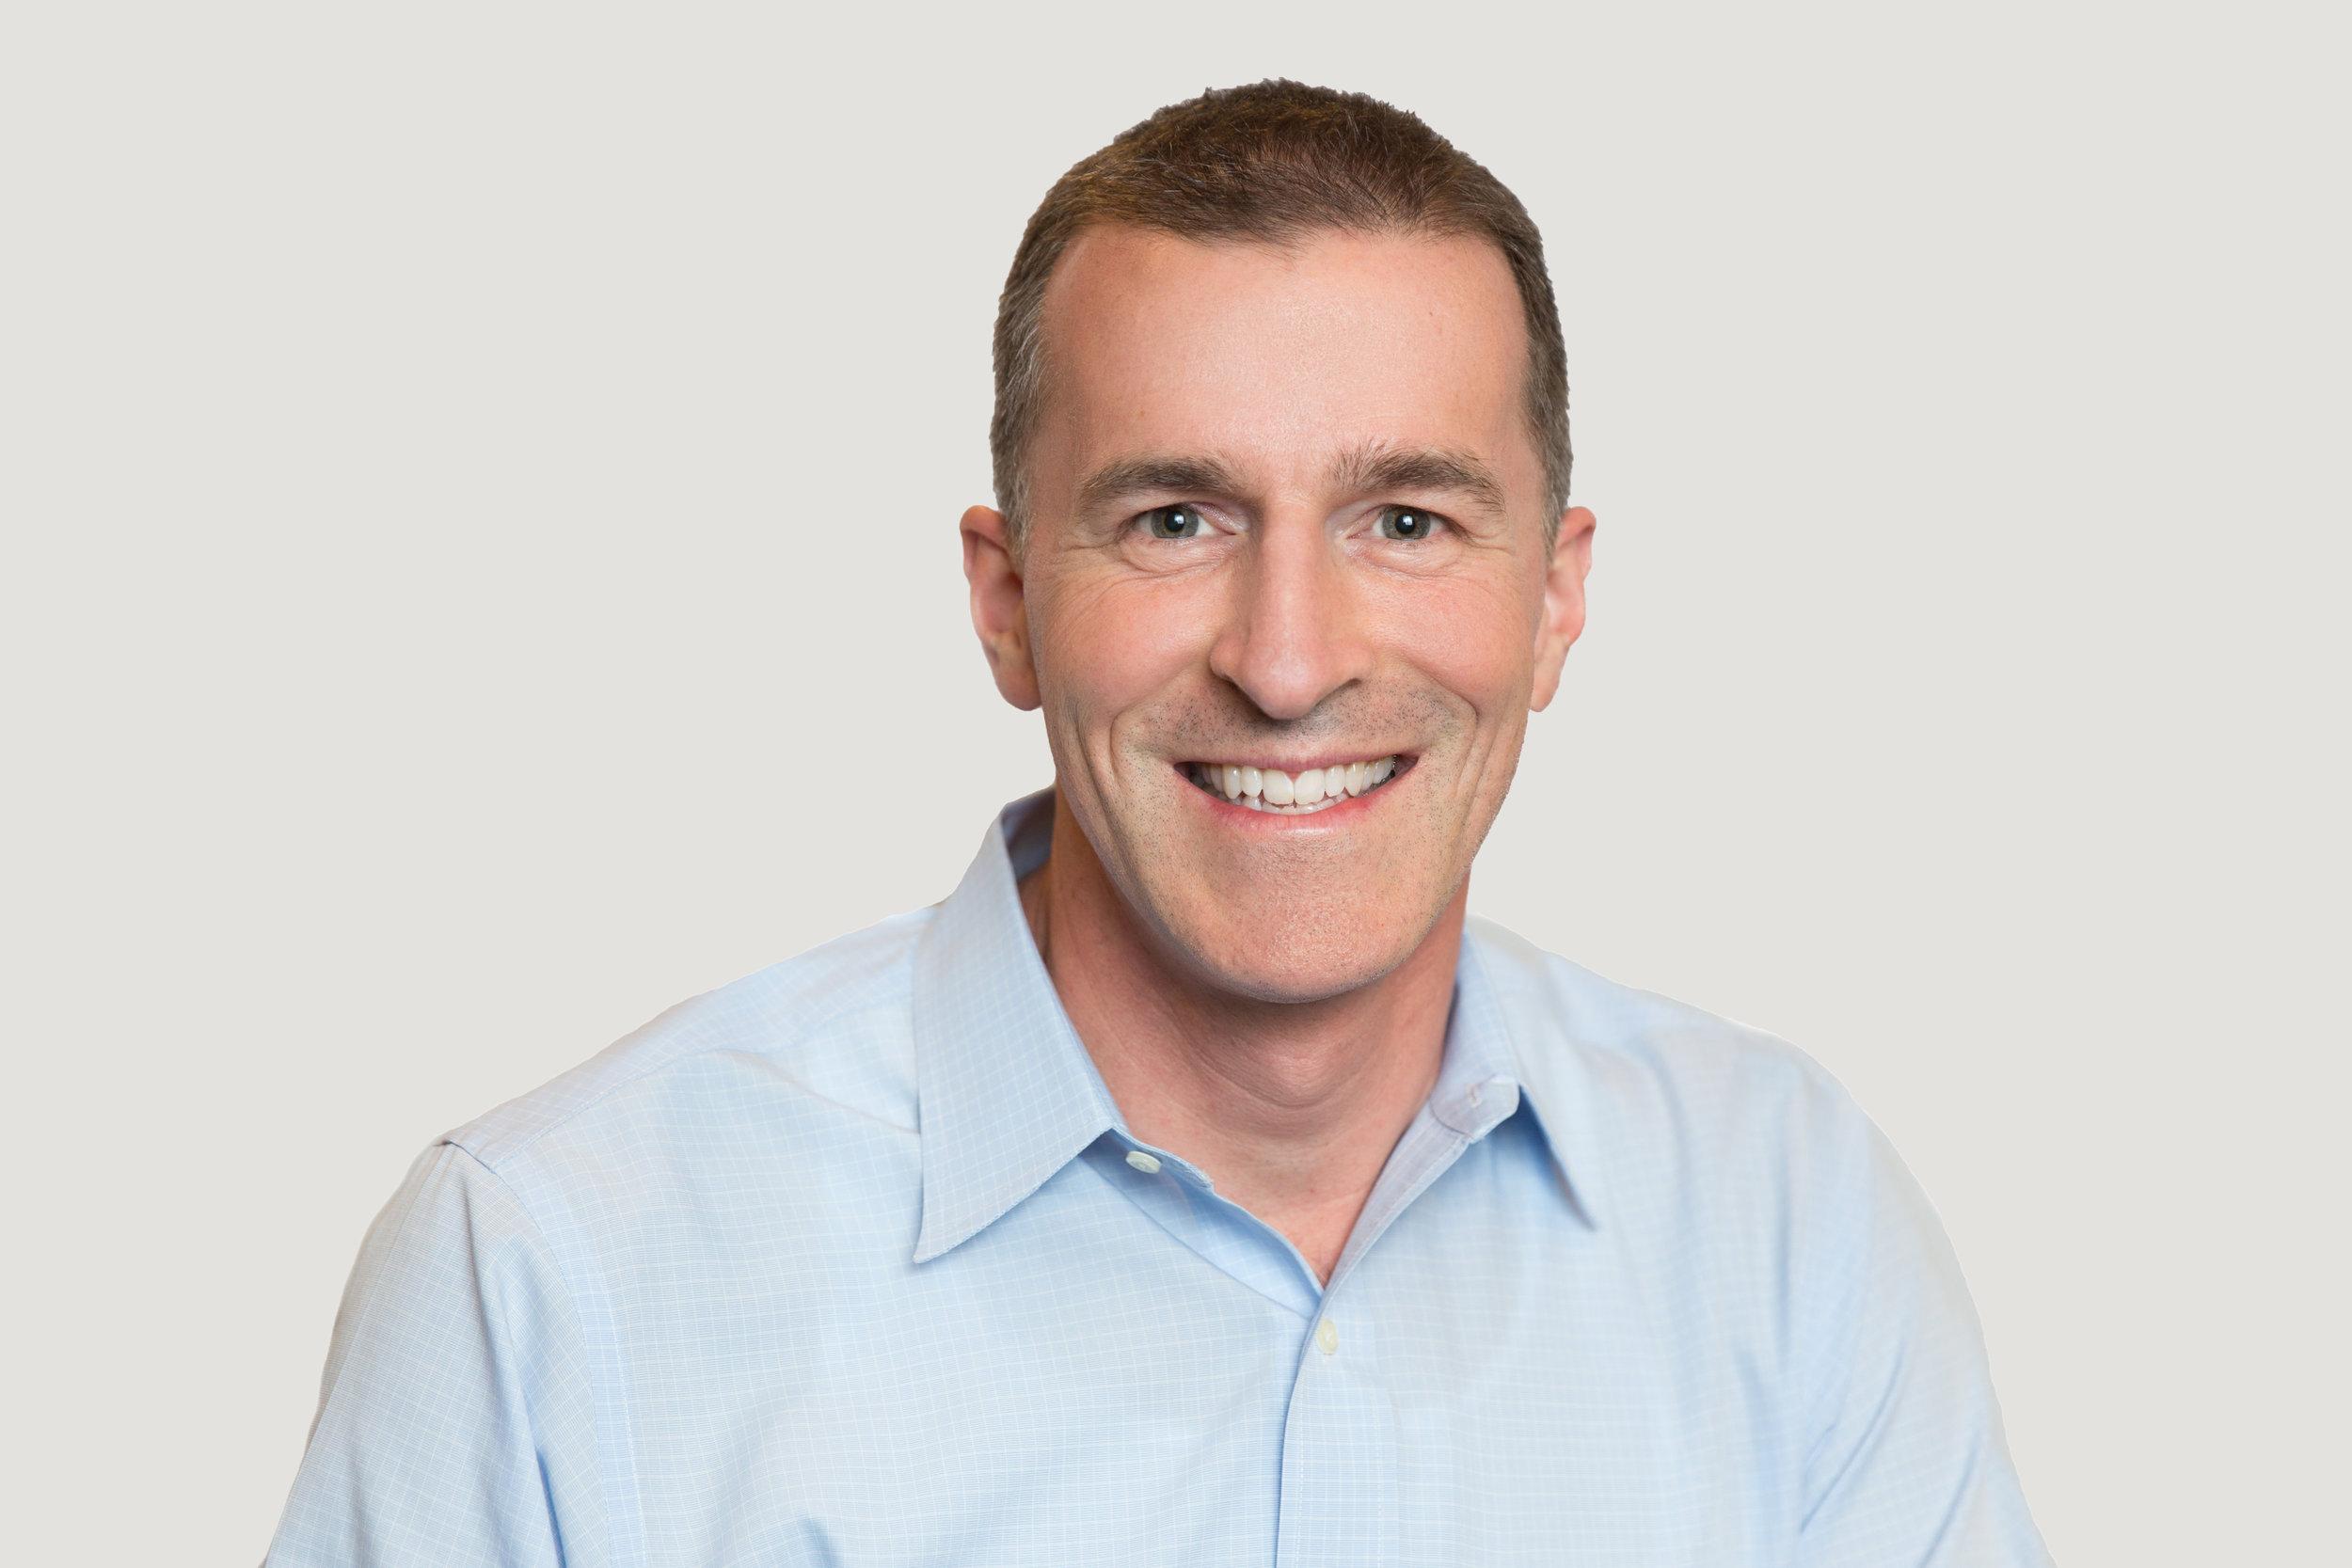 Todd Hilbelink, MD